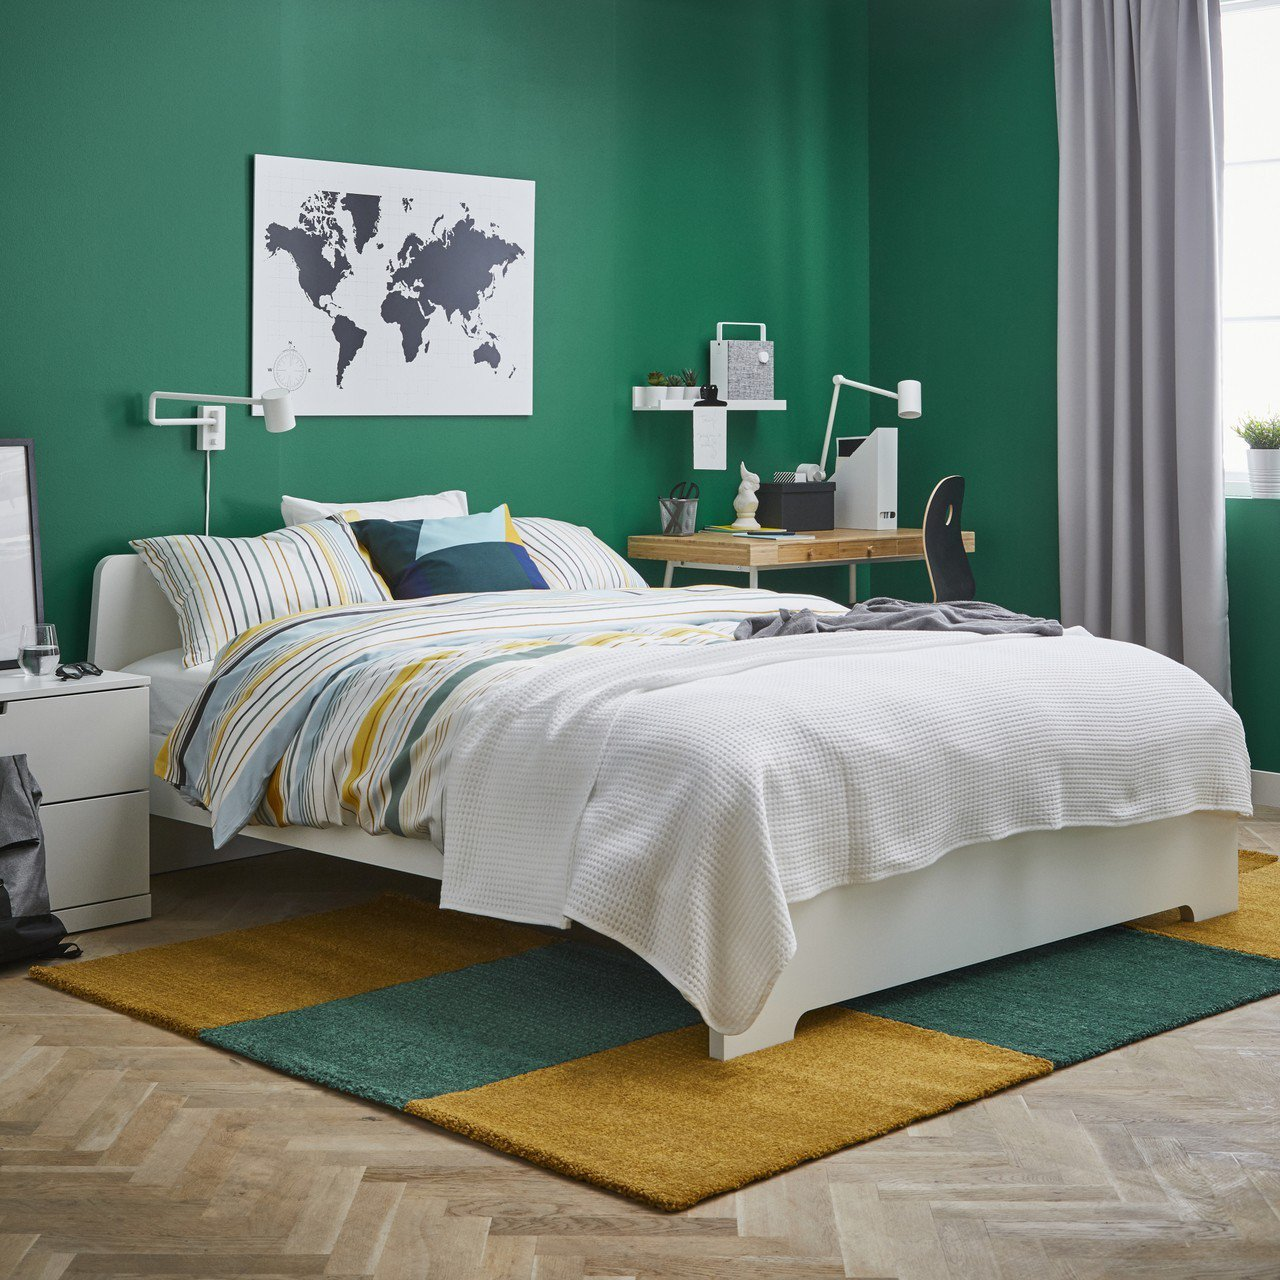 LANGSTED短毛地毯有不同顏色和尺寸可拼裝,避免噪音干擾睡眠,也能成為風格配...